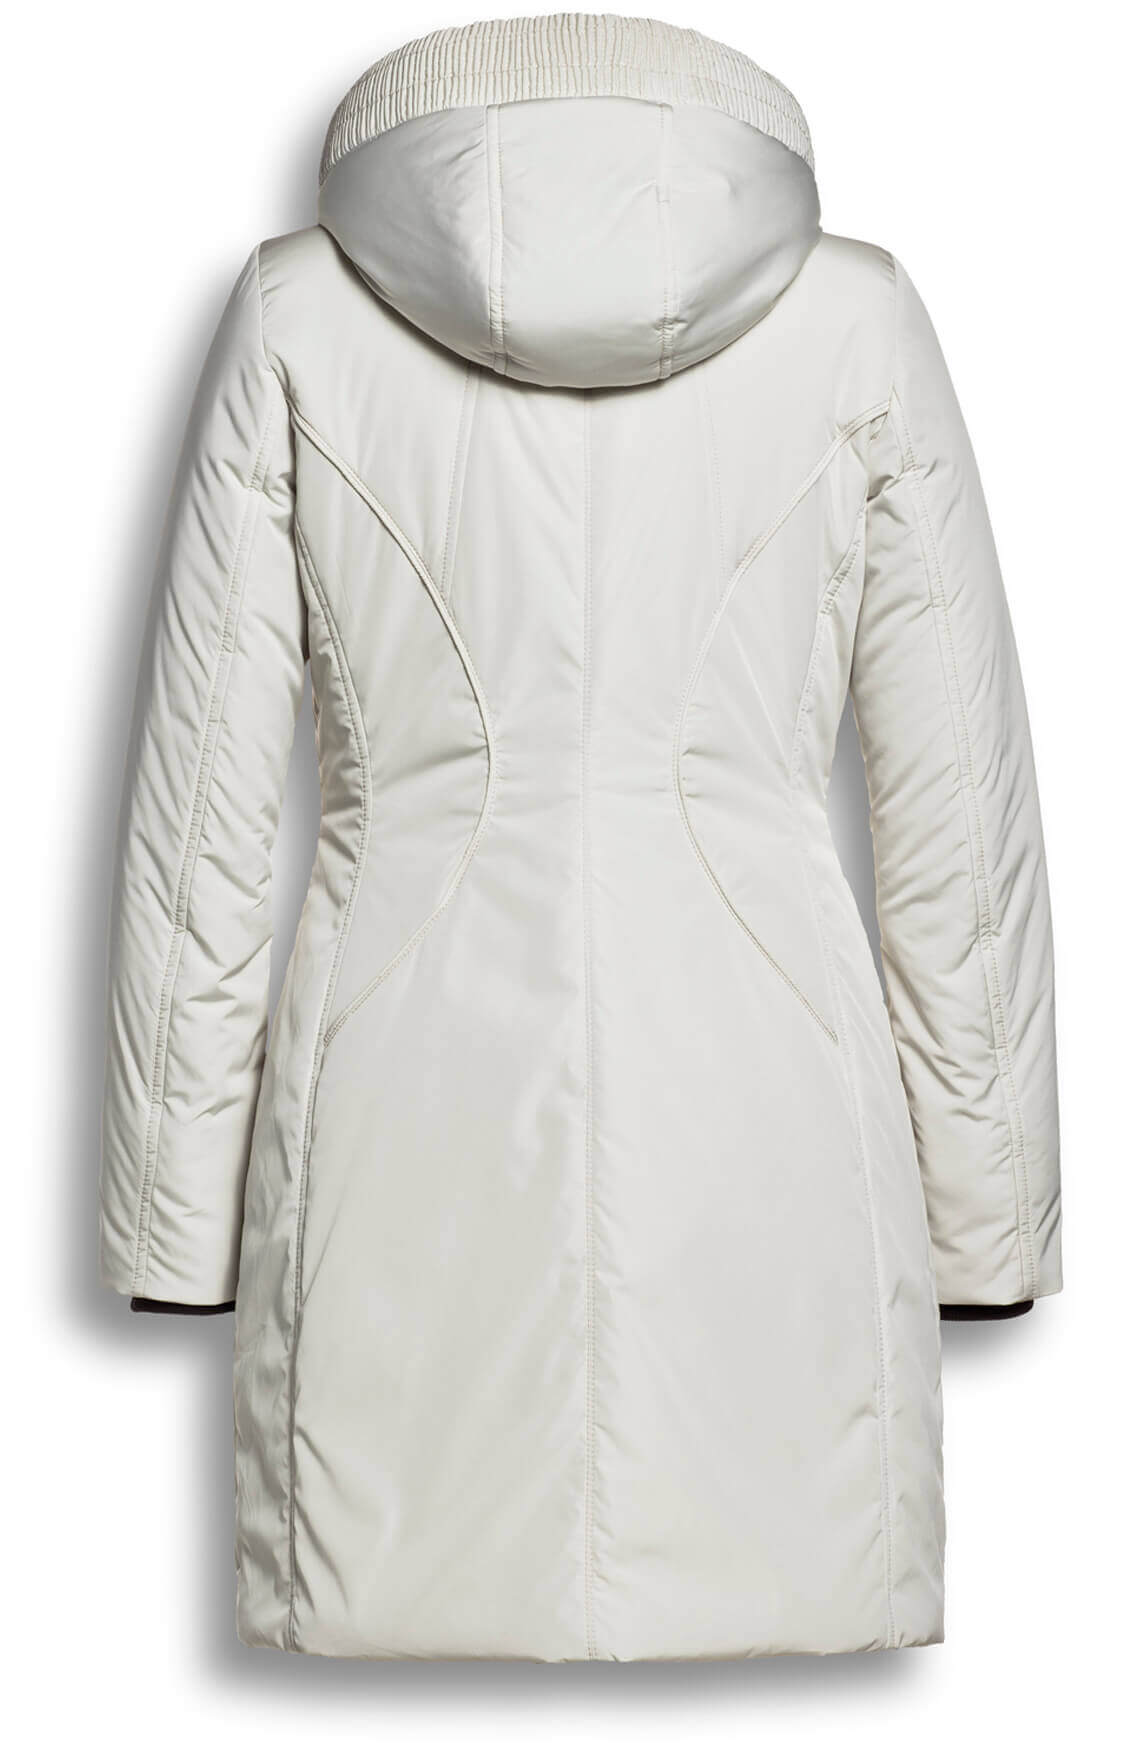 Creenstone Dames Gewatteerde jas met capuchon wit